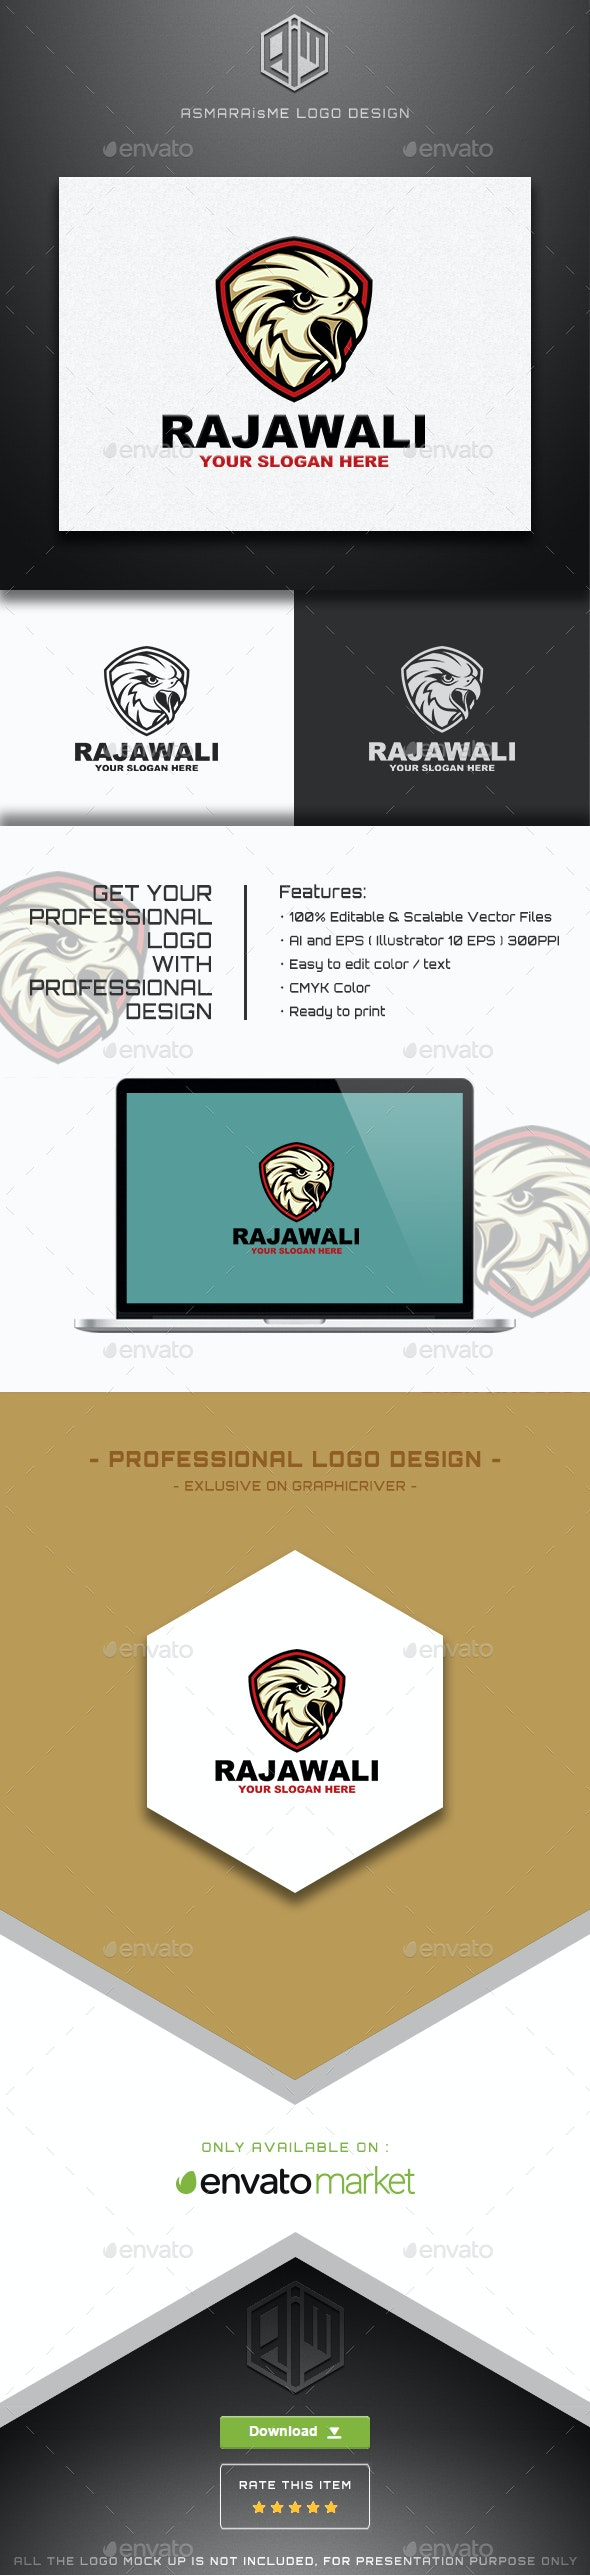 Rajawali - Eagle Shield Logo Template - Animals Logo Templates